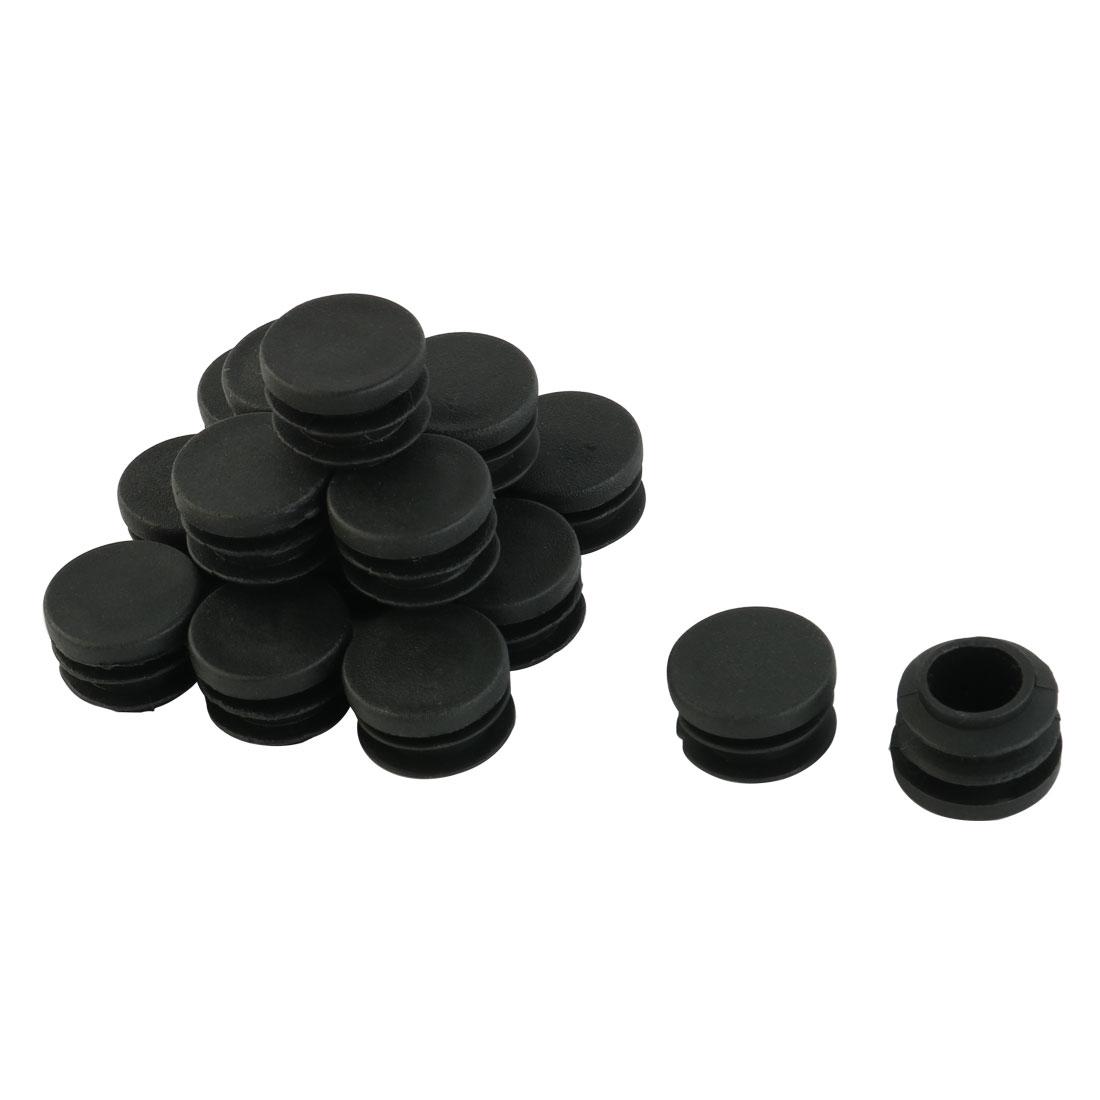 Furniture Foot Plastic Round Tube Insert Cap Cover Protector Black 19mm Dia 16pcs